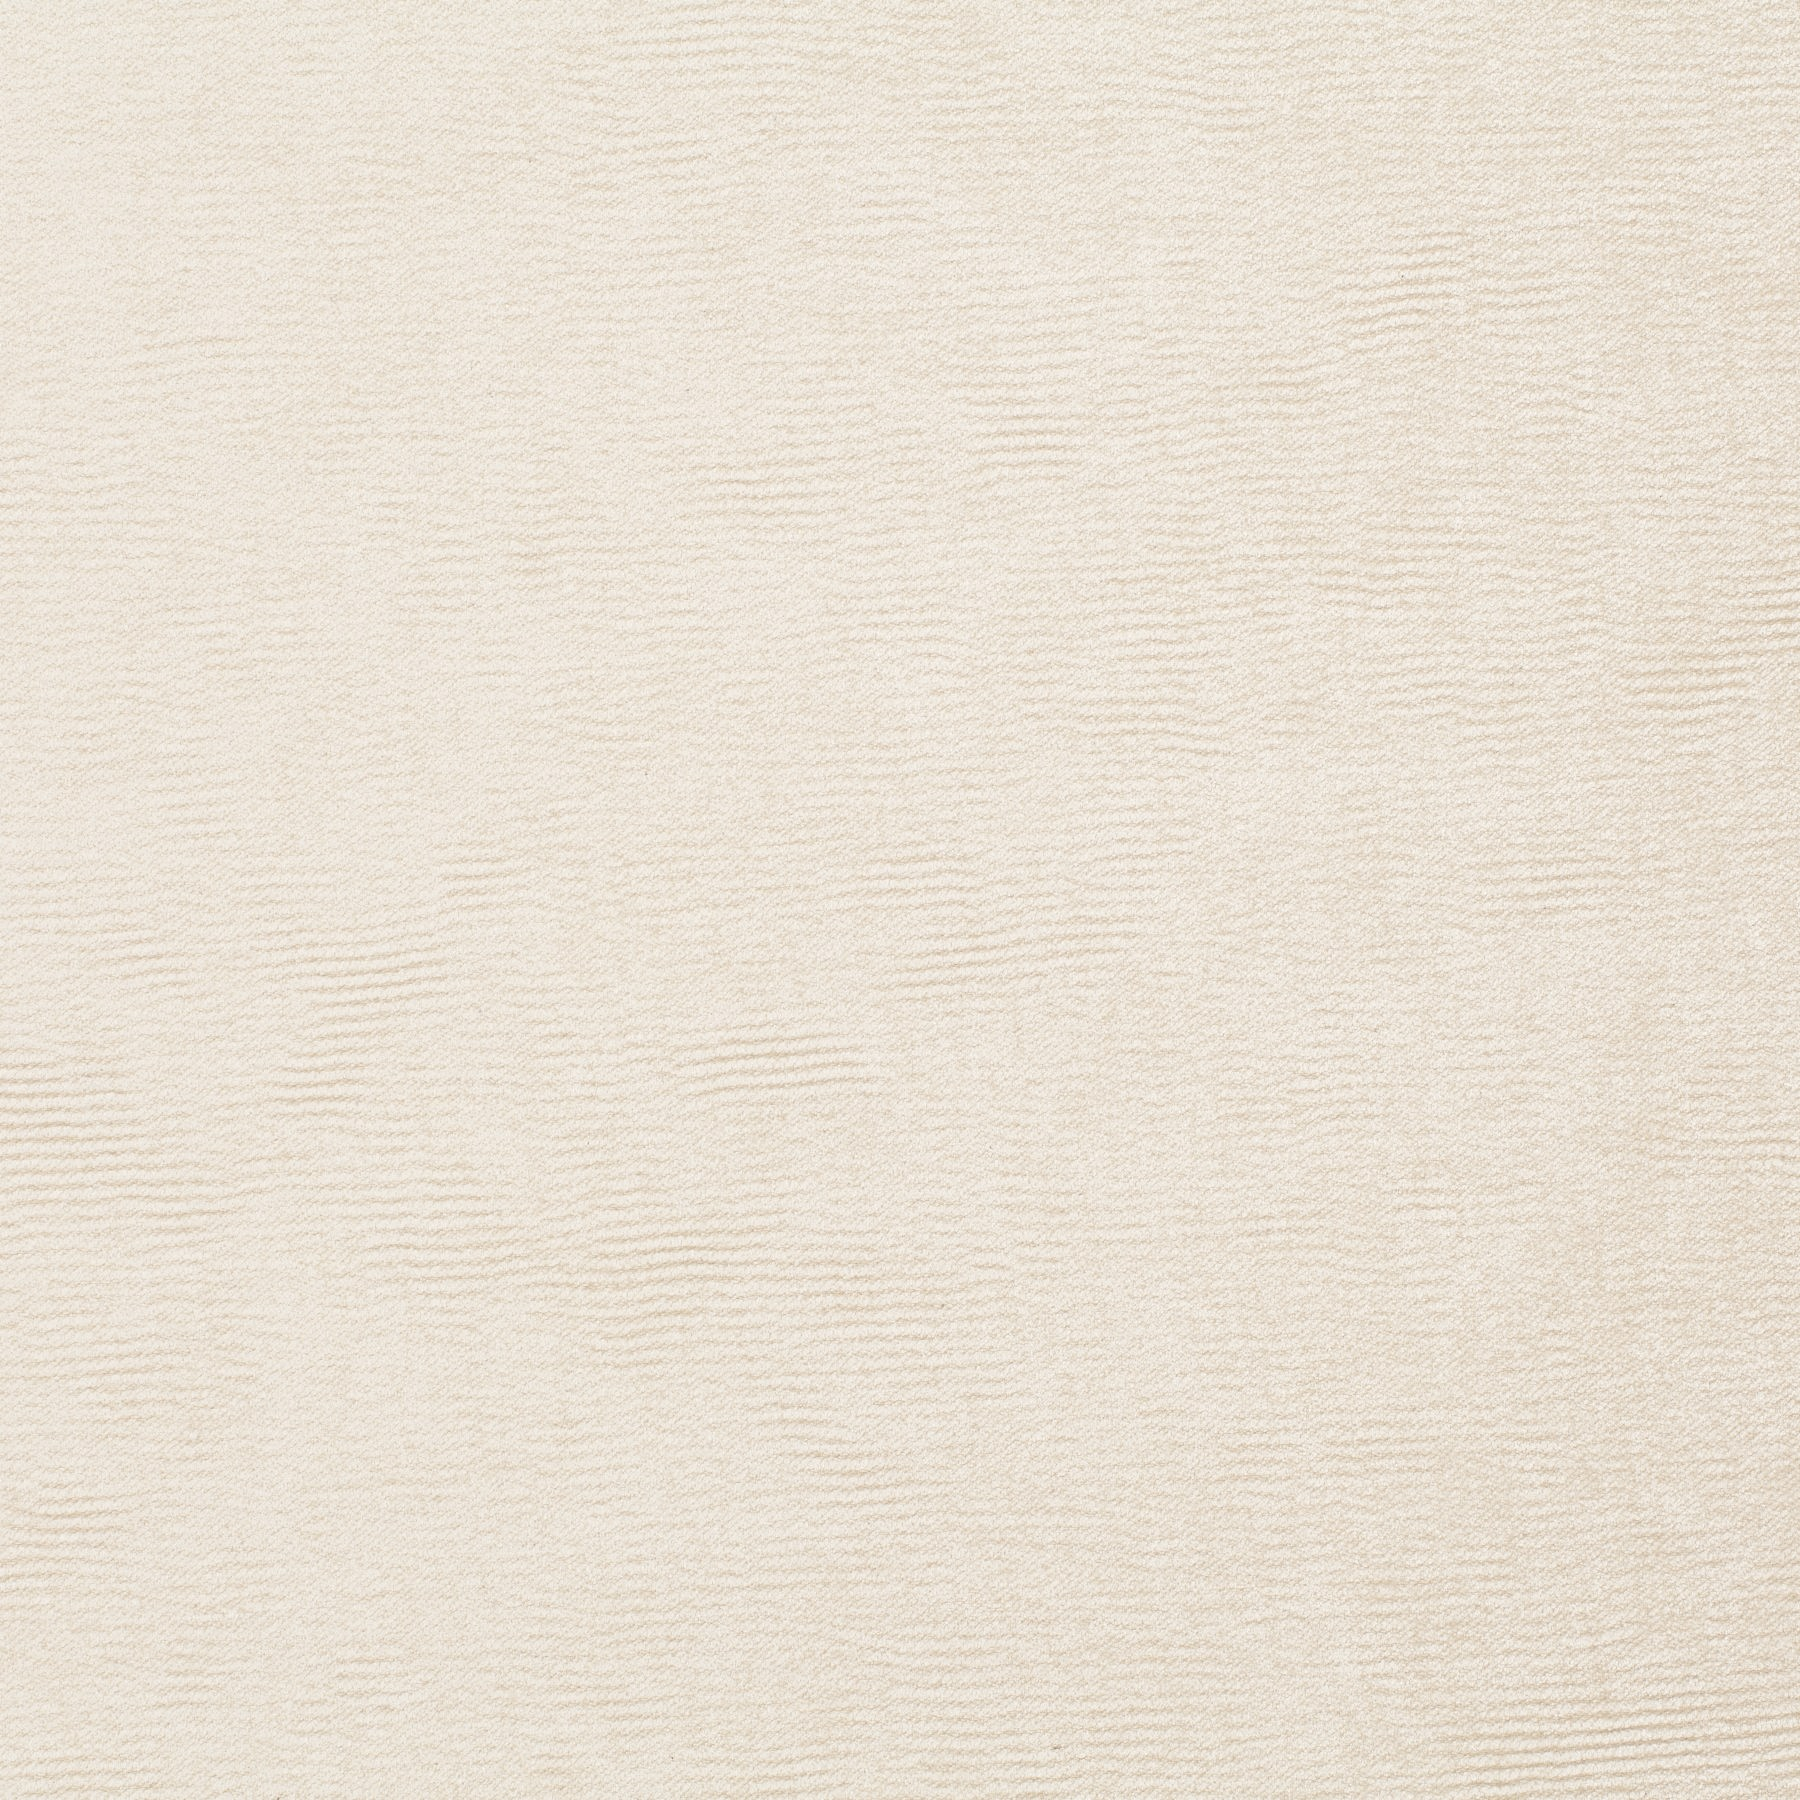 upholstery fabric primrose hill 1 1344 070 jab anstoetz. Black Bedroom Furniture Sets. Home Design Ideas